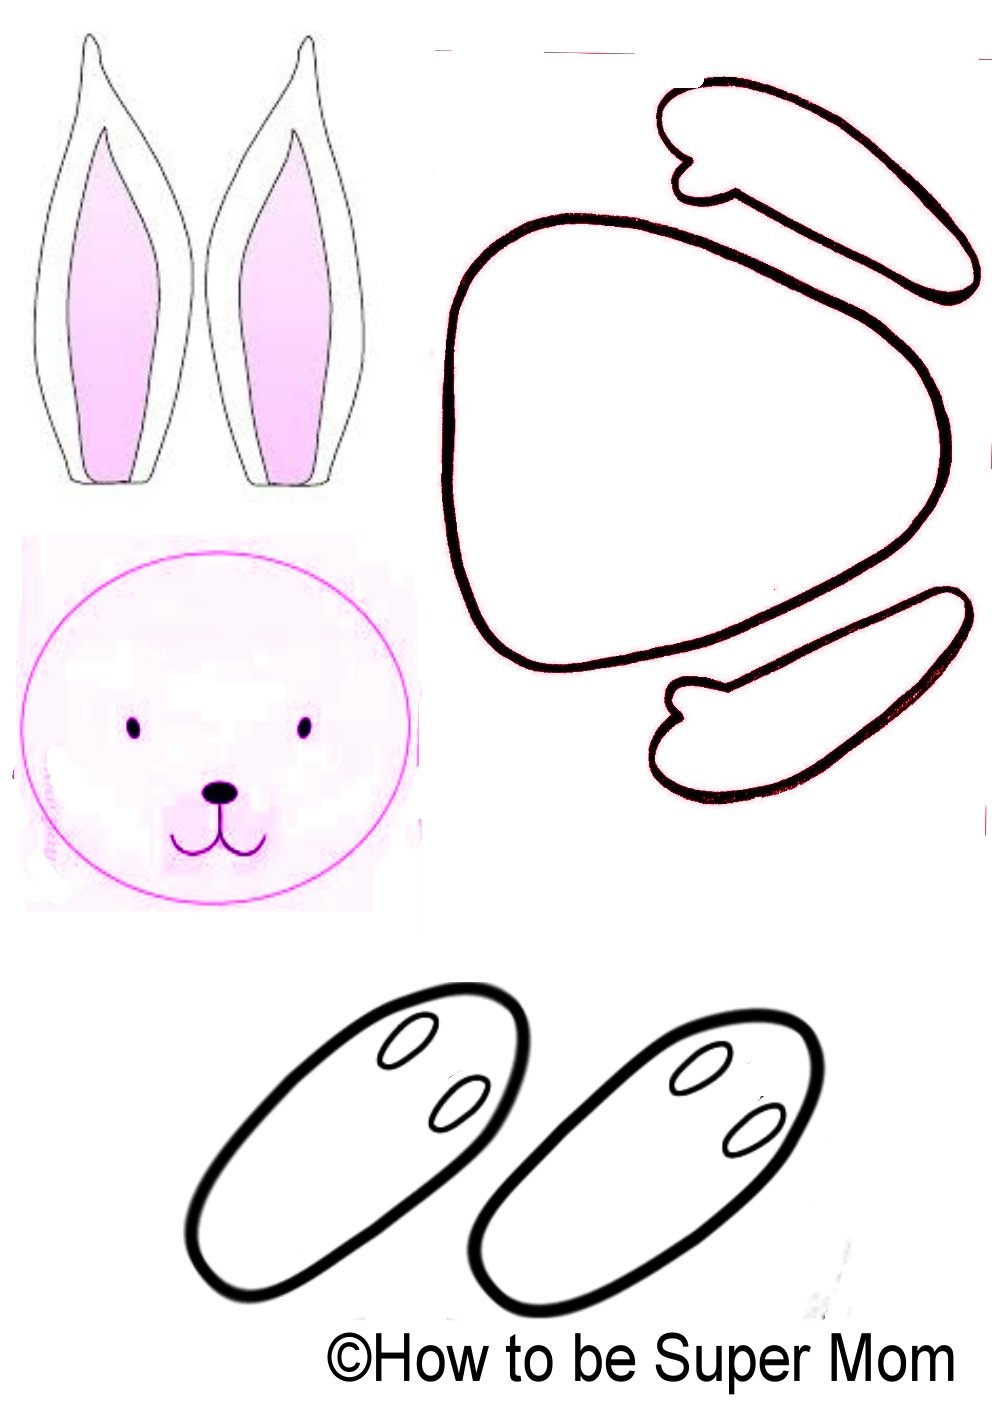 Free Rabbit Template, Download Free Clip Art, Free Clip Art On - Free Printable Bunny Templates